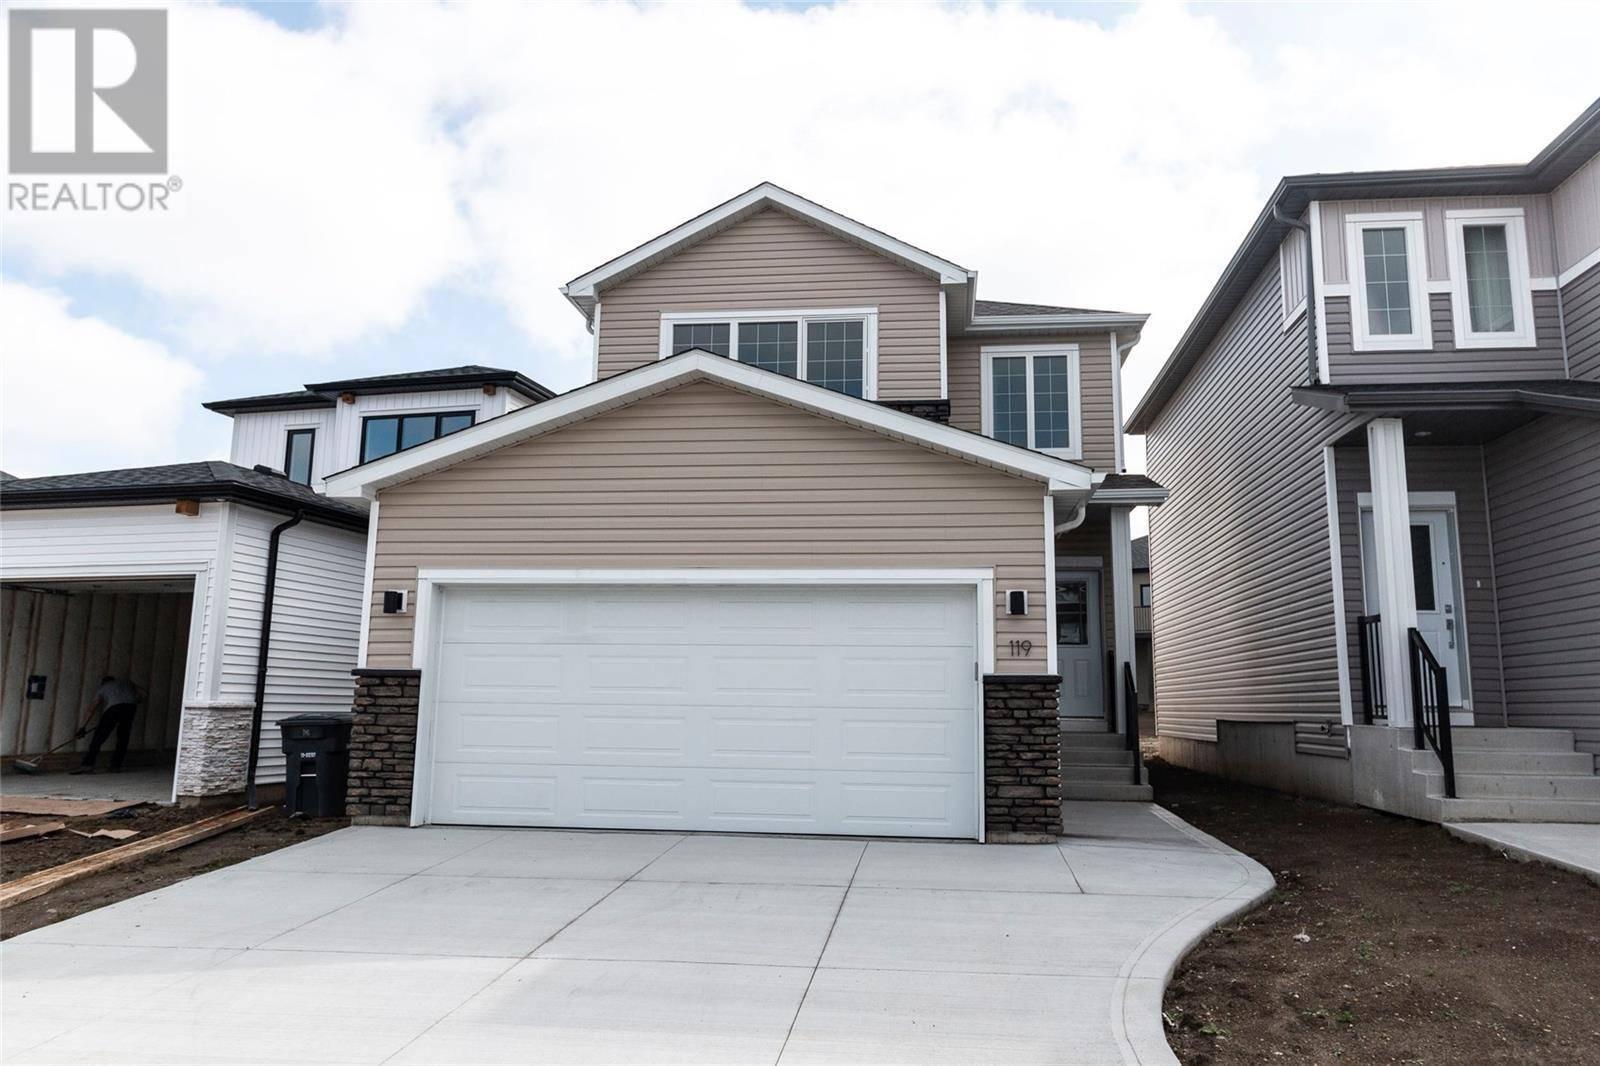 House for sale at 119 Burgess Cres Saskatoon Saskatchewan - MLS: SK787214